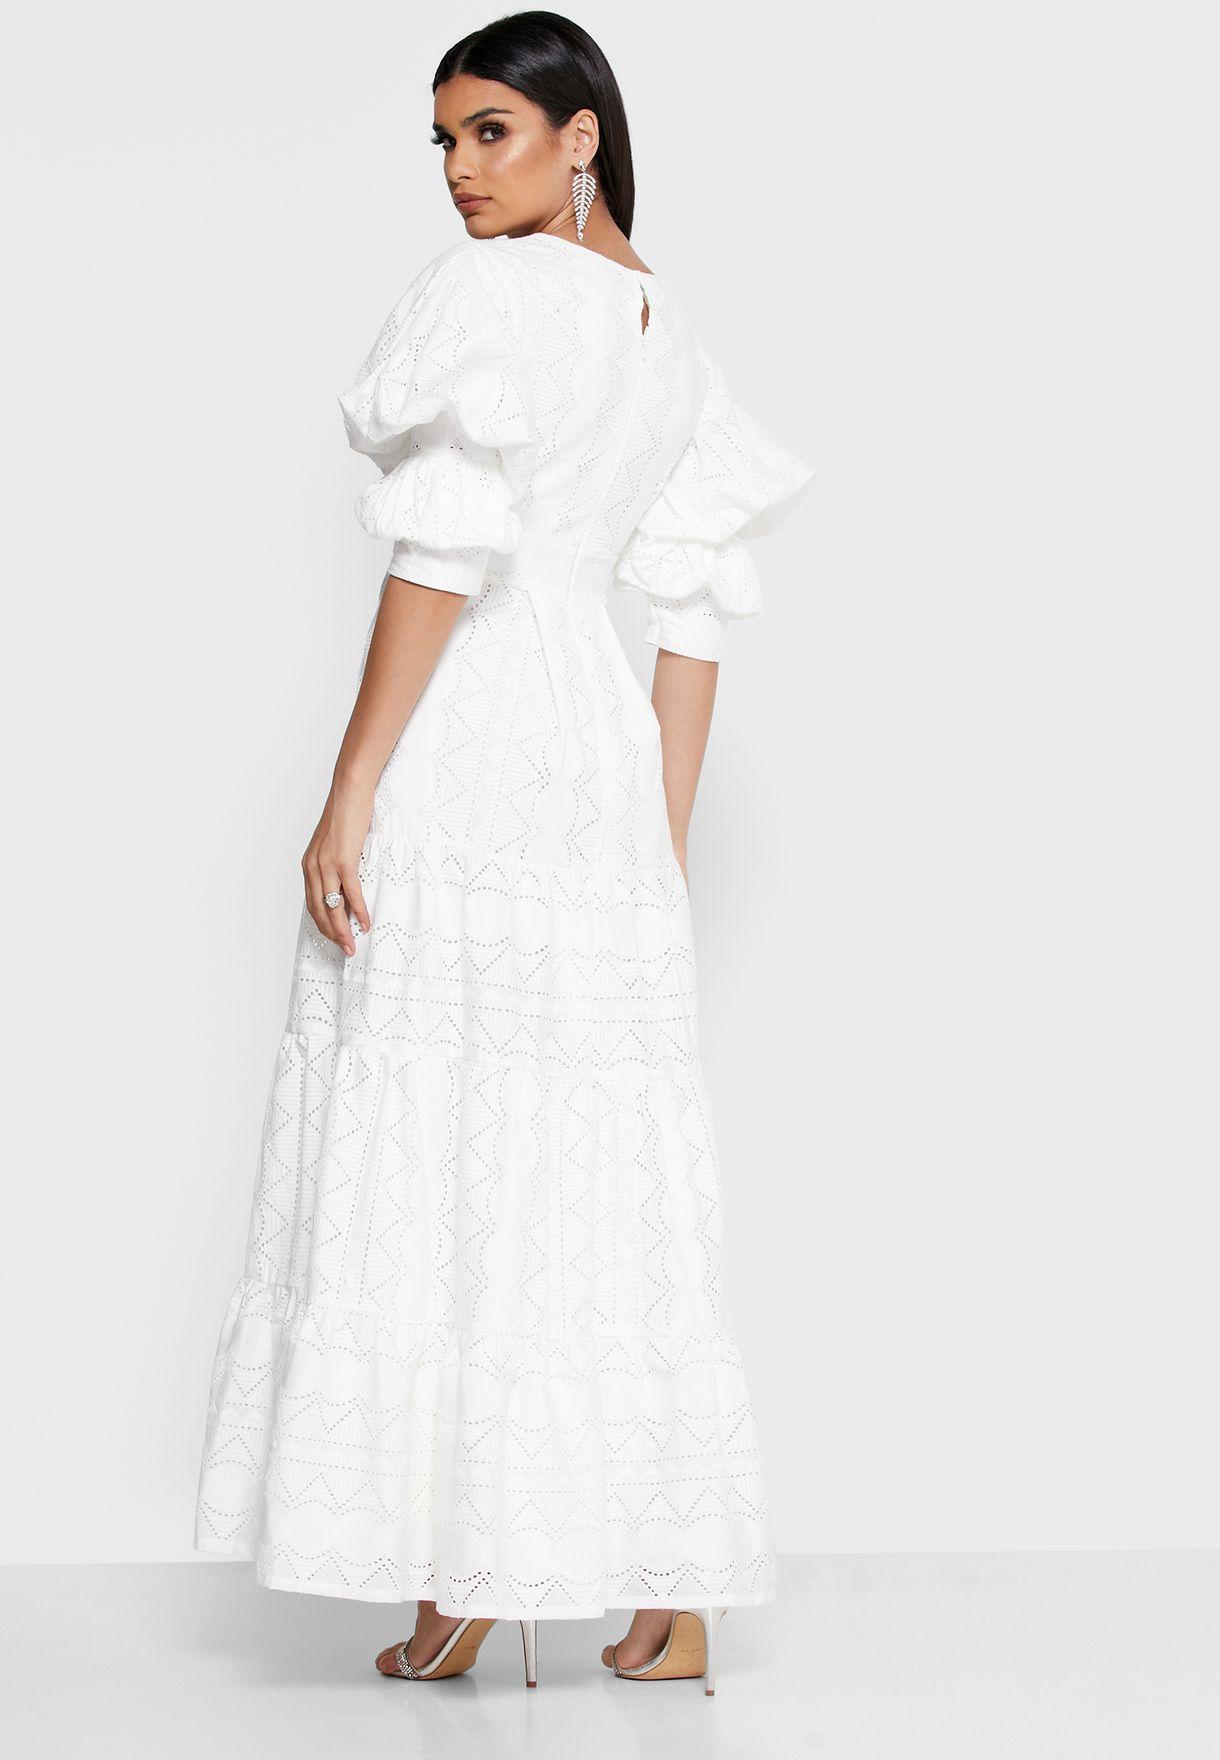 Puffed Sleeve Schiffli Dress